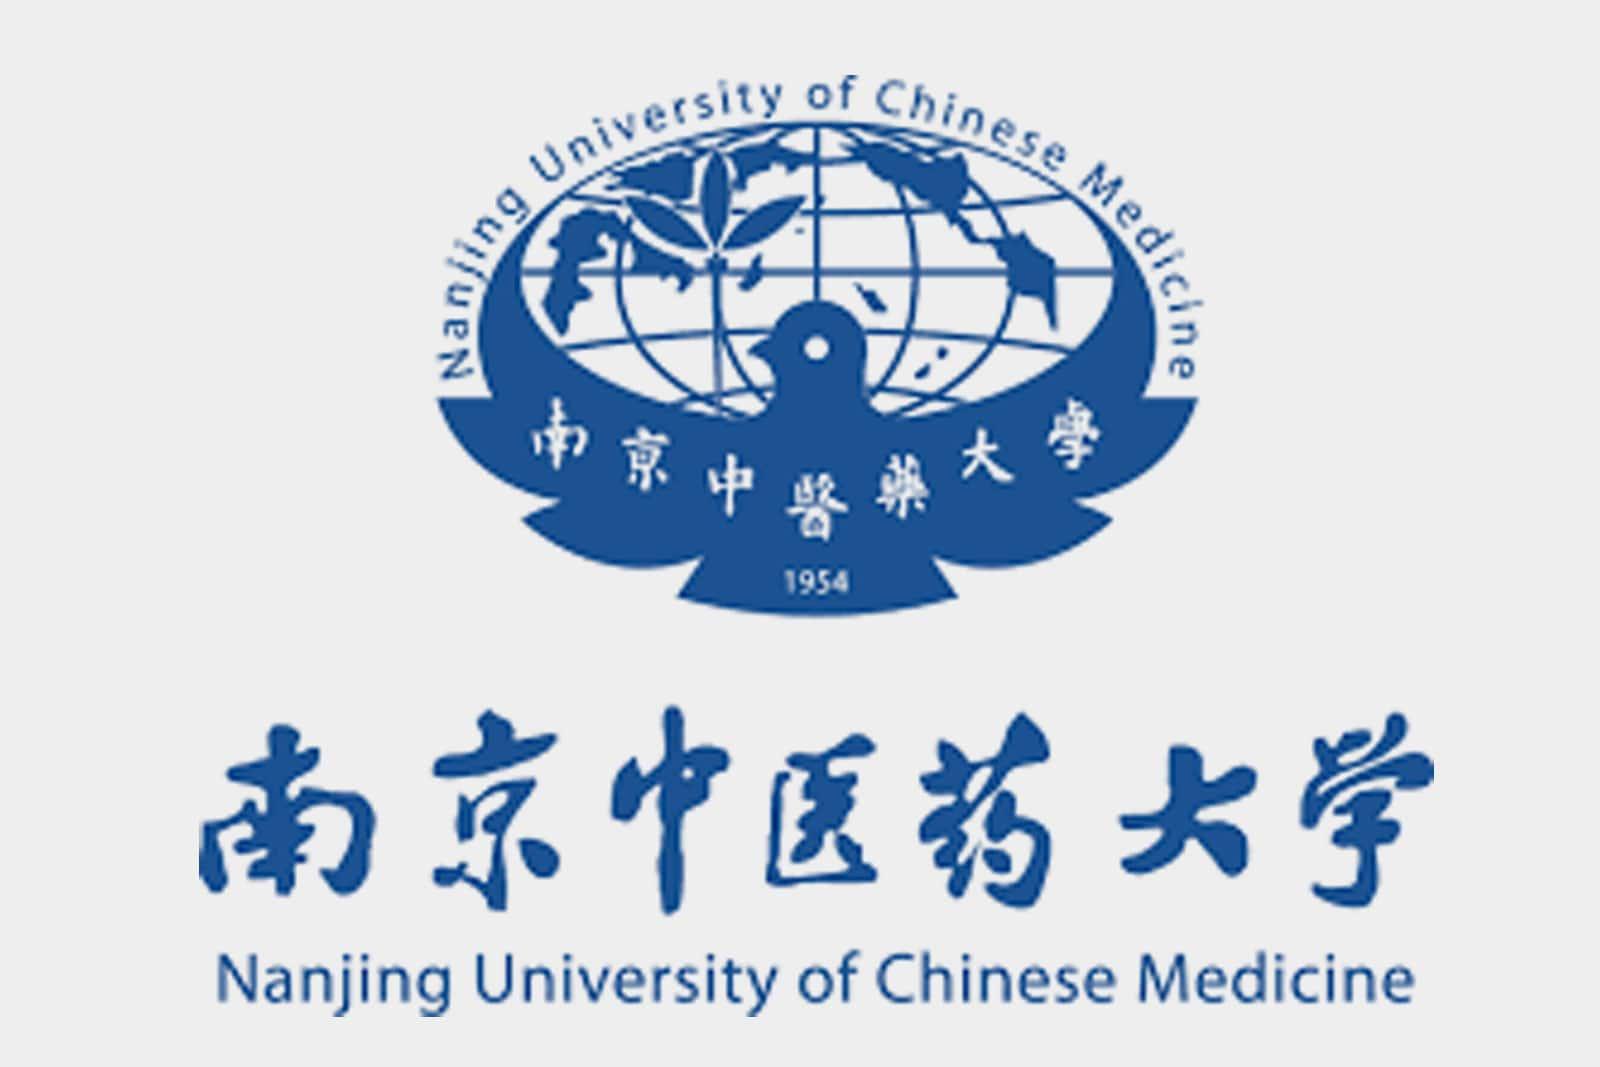 Master PHD TM opleiding. Goedgekeurd door Nanjing University of Chinese Medicine- Shenzhou Open University of TCM